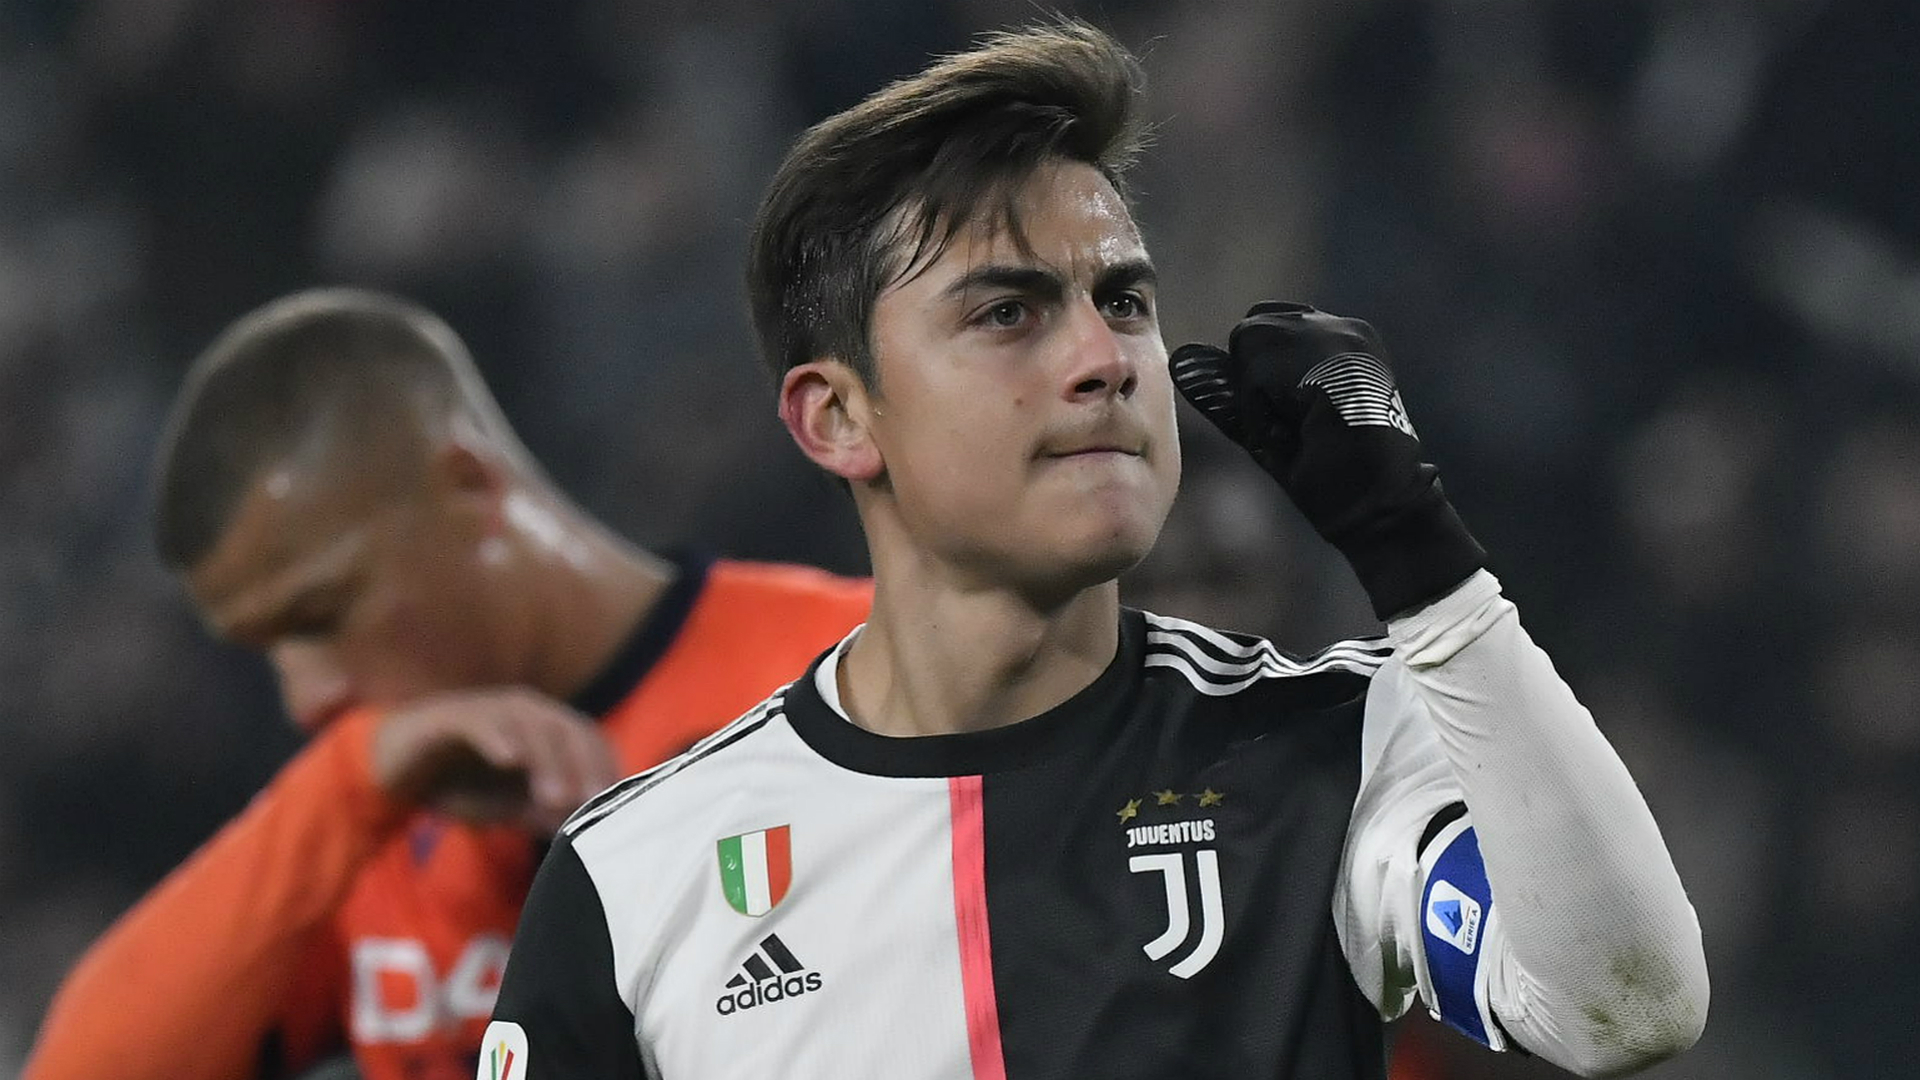 Juventus 4-0 Udinese: Dybala double sinks Udinese as Juve hit four without sick Ronaldo